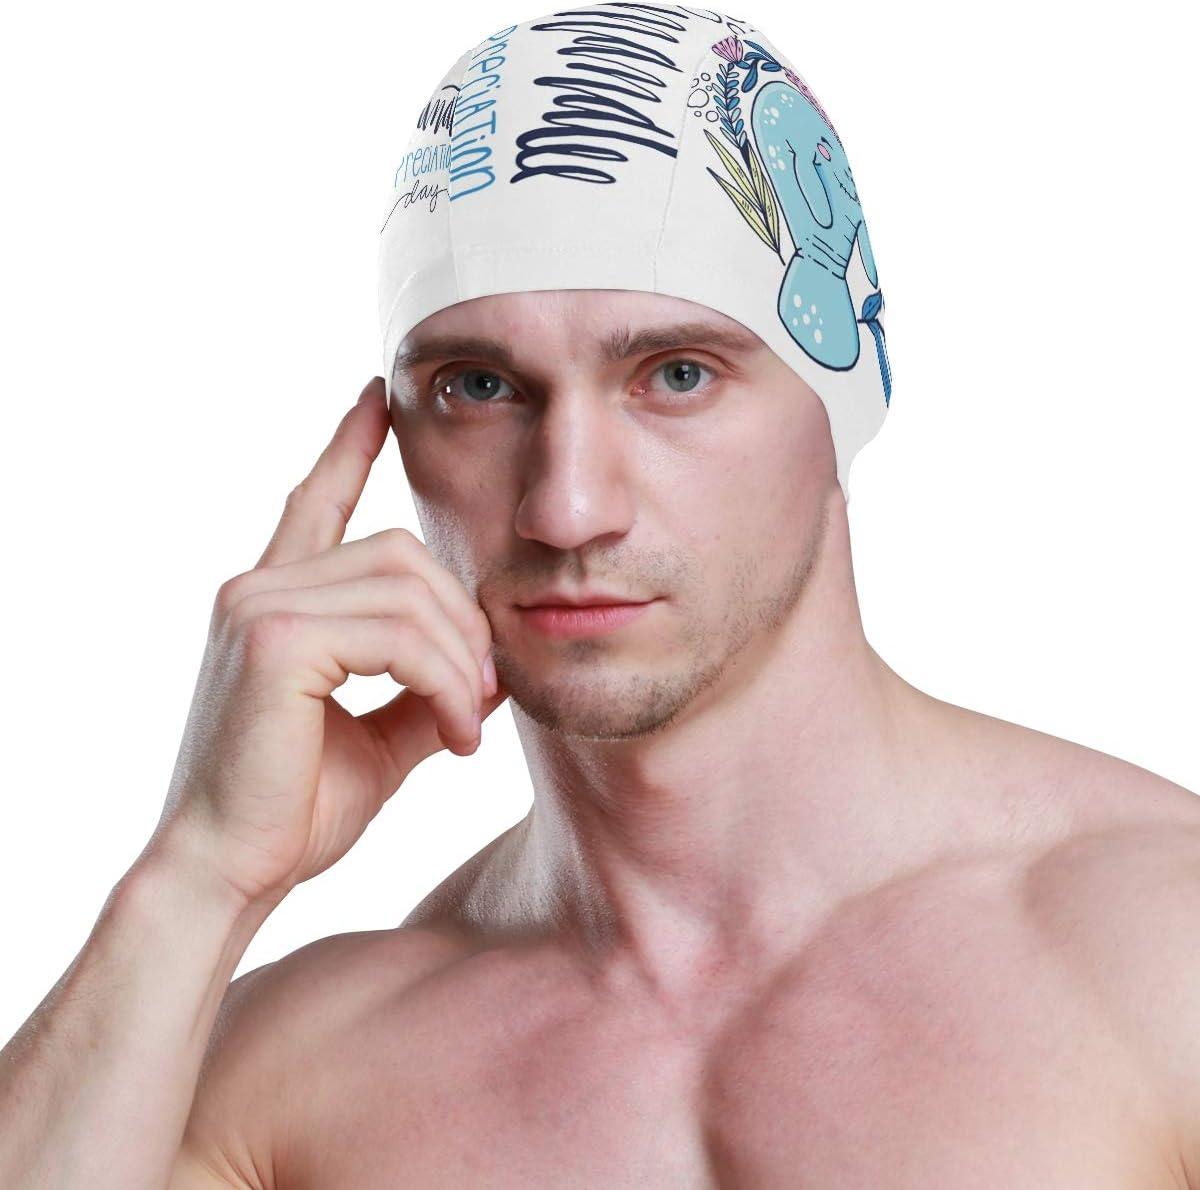 ALINLO Swim Caps Lovely Funny Cartoon Mermaid Dolphin Flower Swimming Cap Hat Waterproof Bathing Shower Hair Cover for Adult Men Women Youth Girls Boys